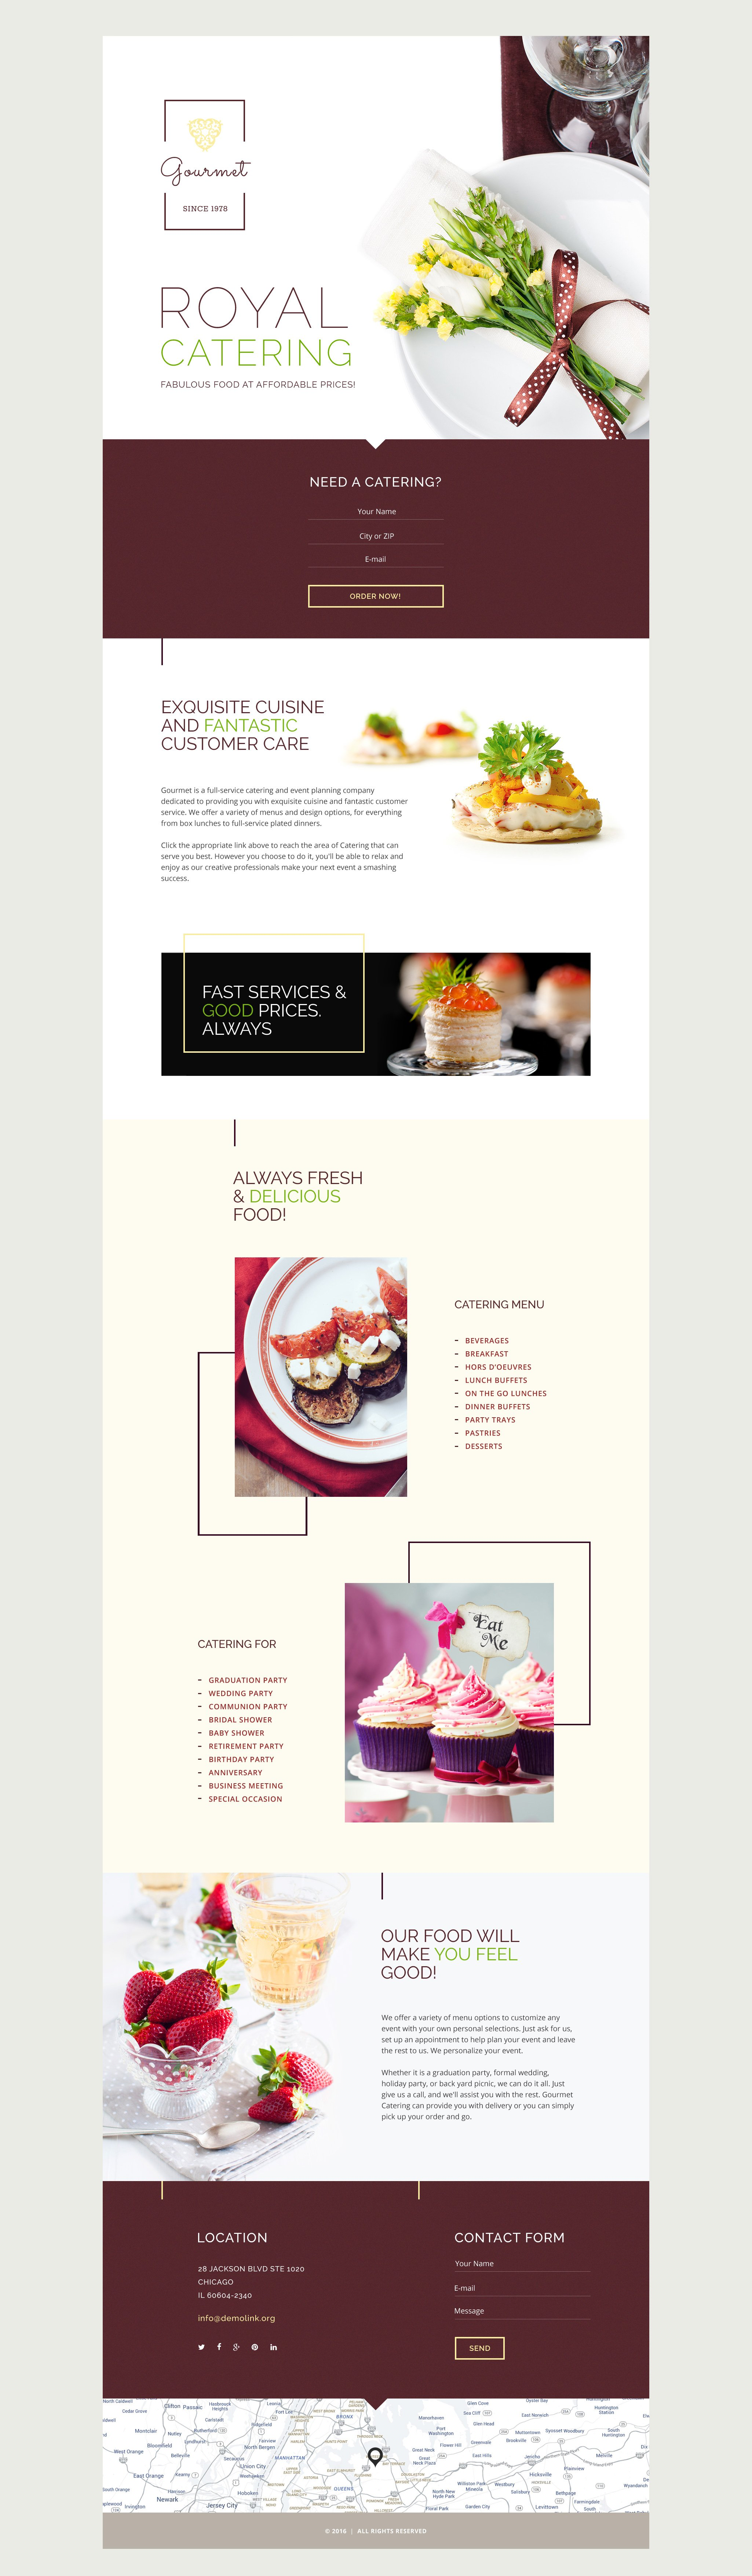 Responsivt Gourmet Landing Page-mall #58458